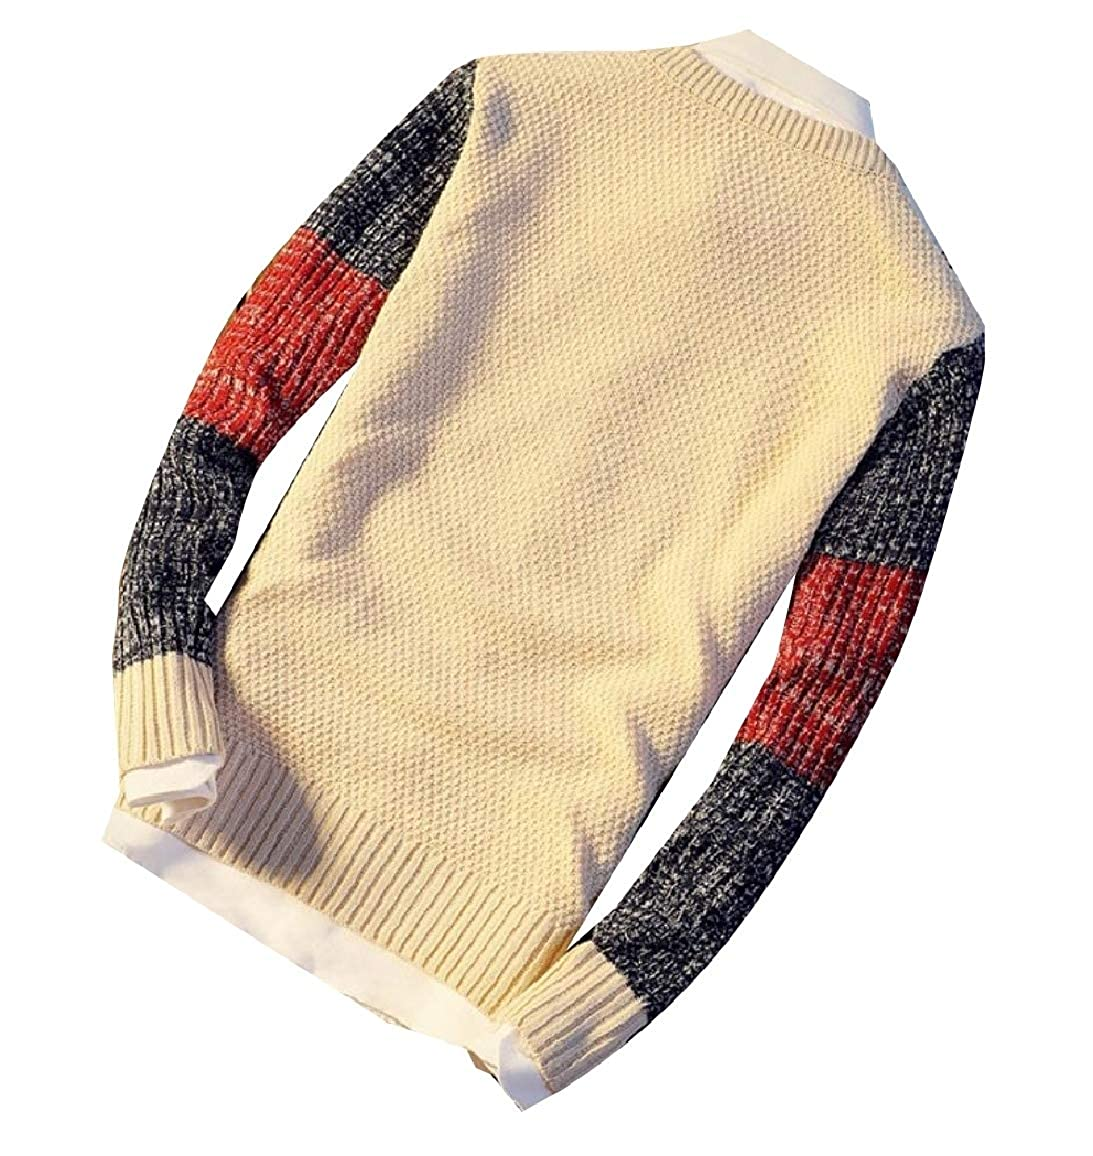 Sebaby Mens Thin Crew-Neck Stitch Contrast Slim Fit Knitwear Sweaters